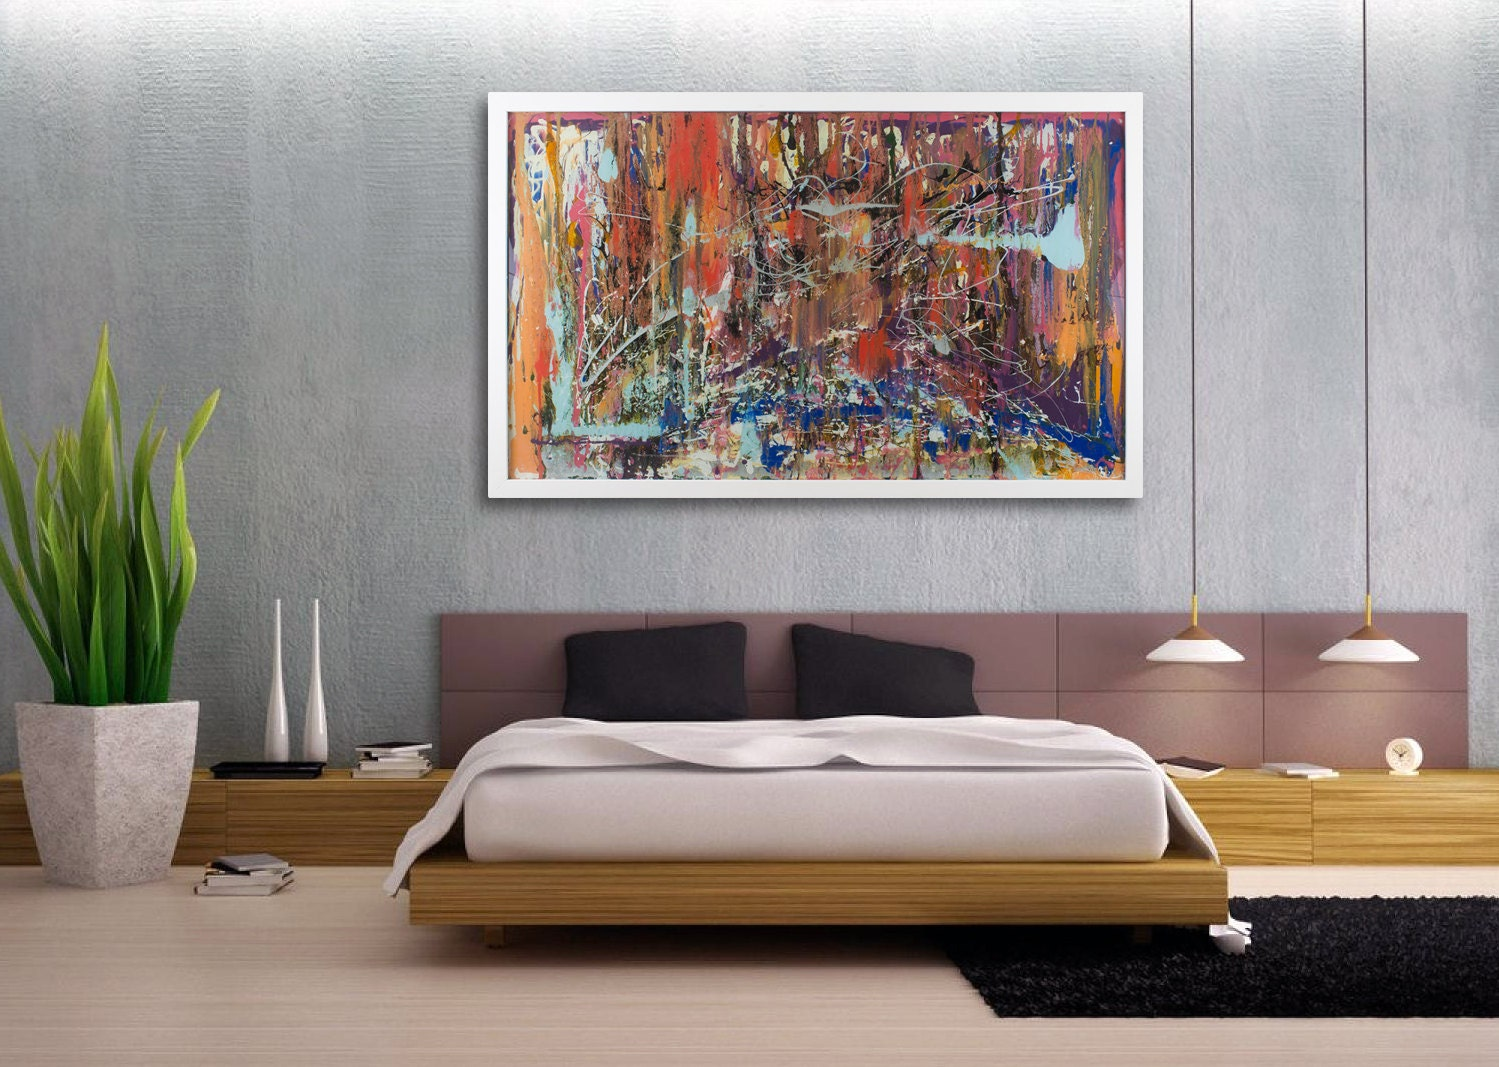 Large Abstract Art Extra Large Art Wall Art Modern glass